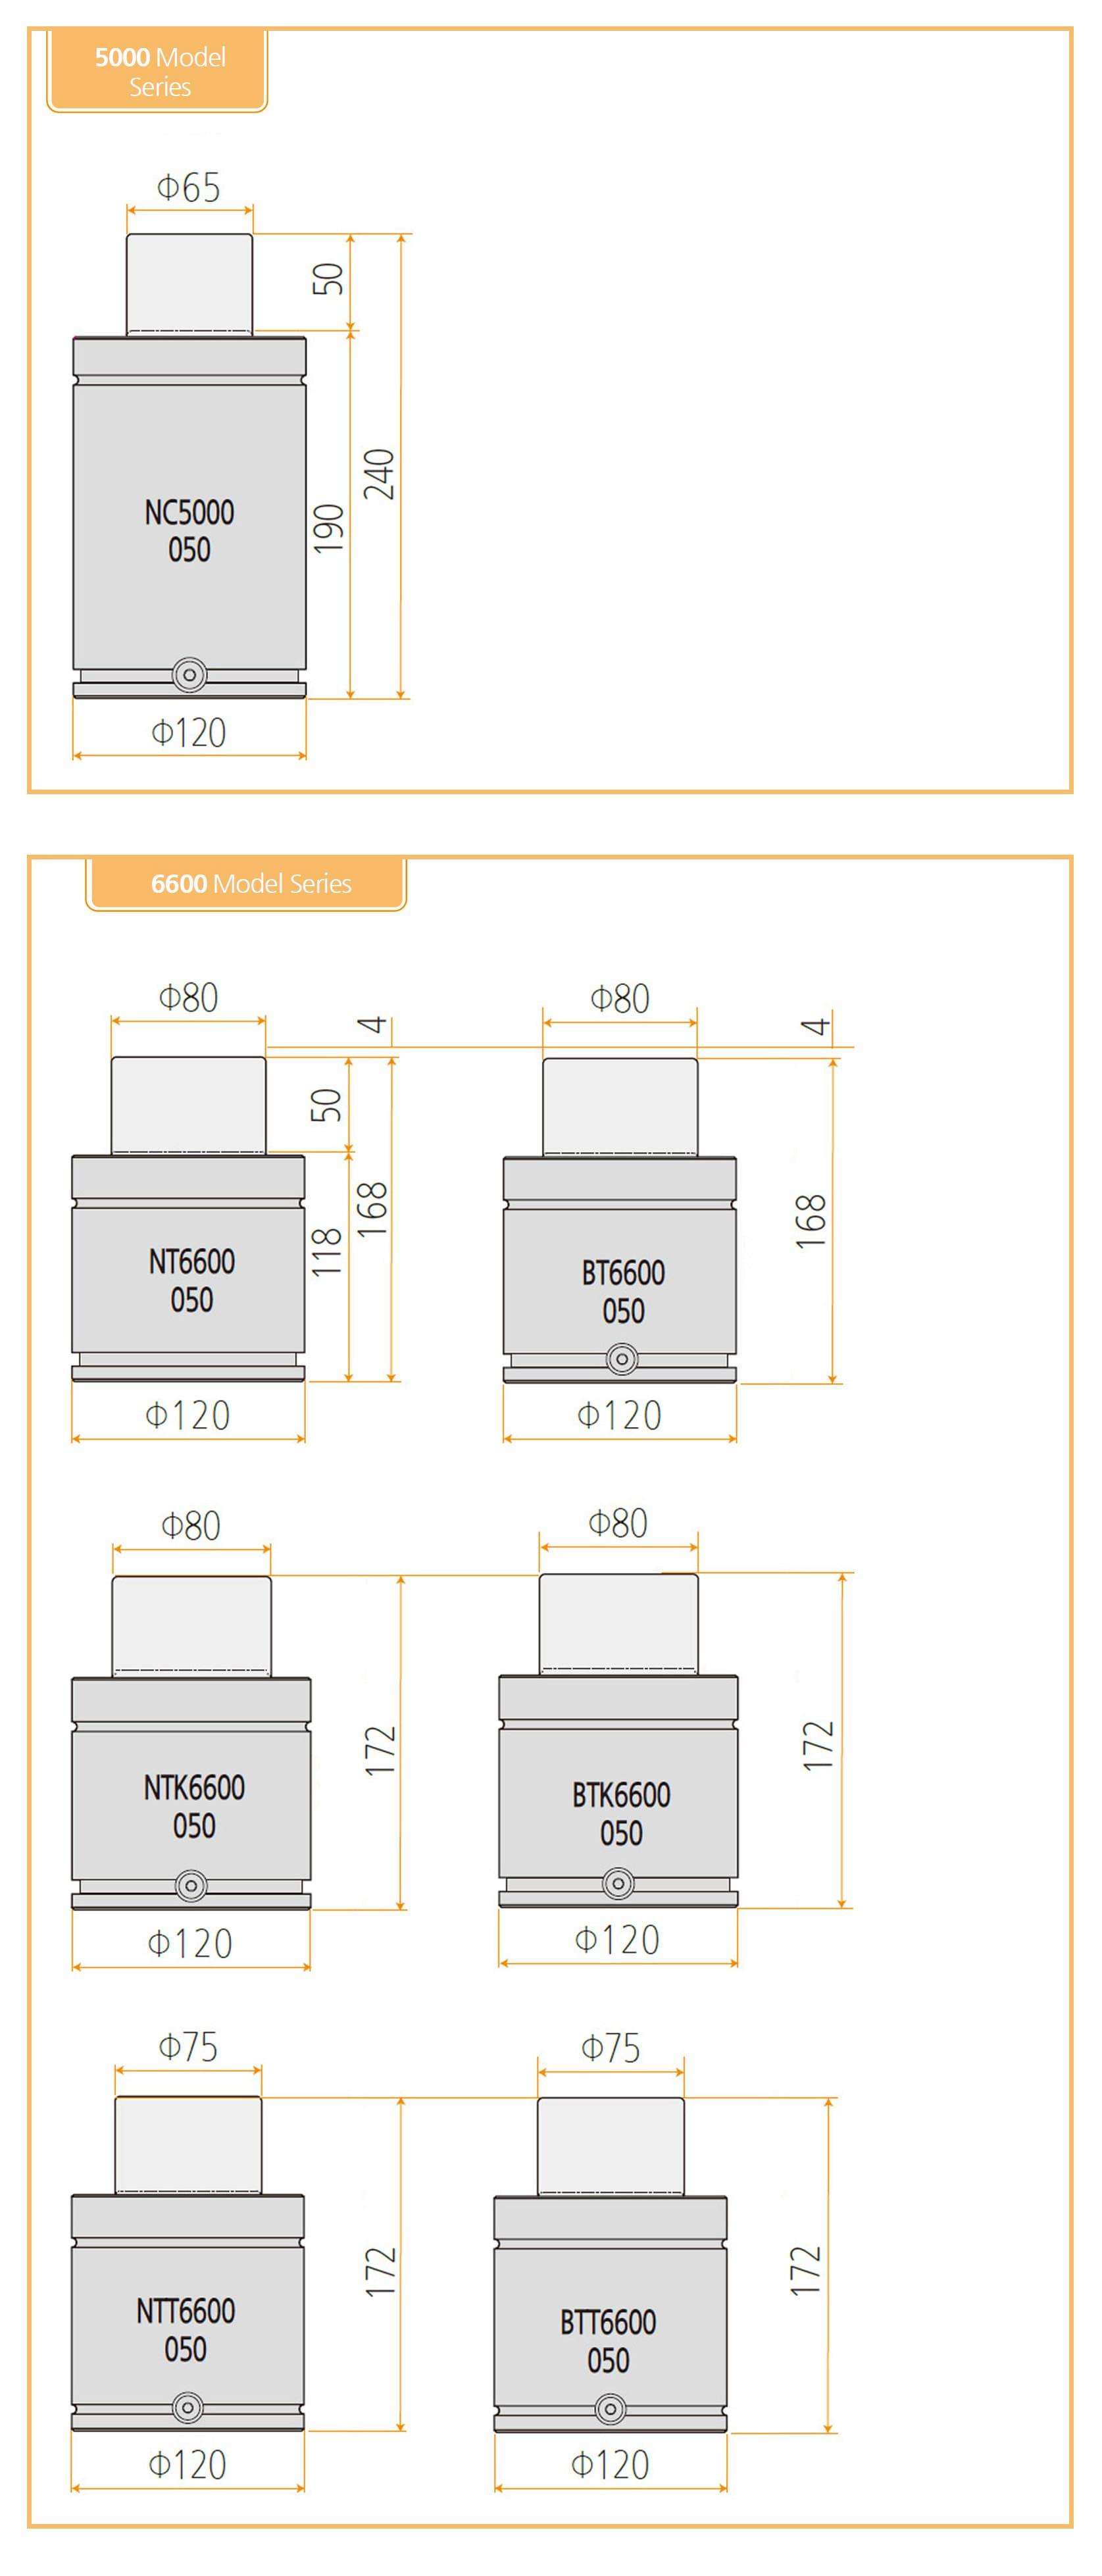 5000, 6600 Model Series